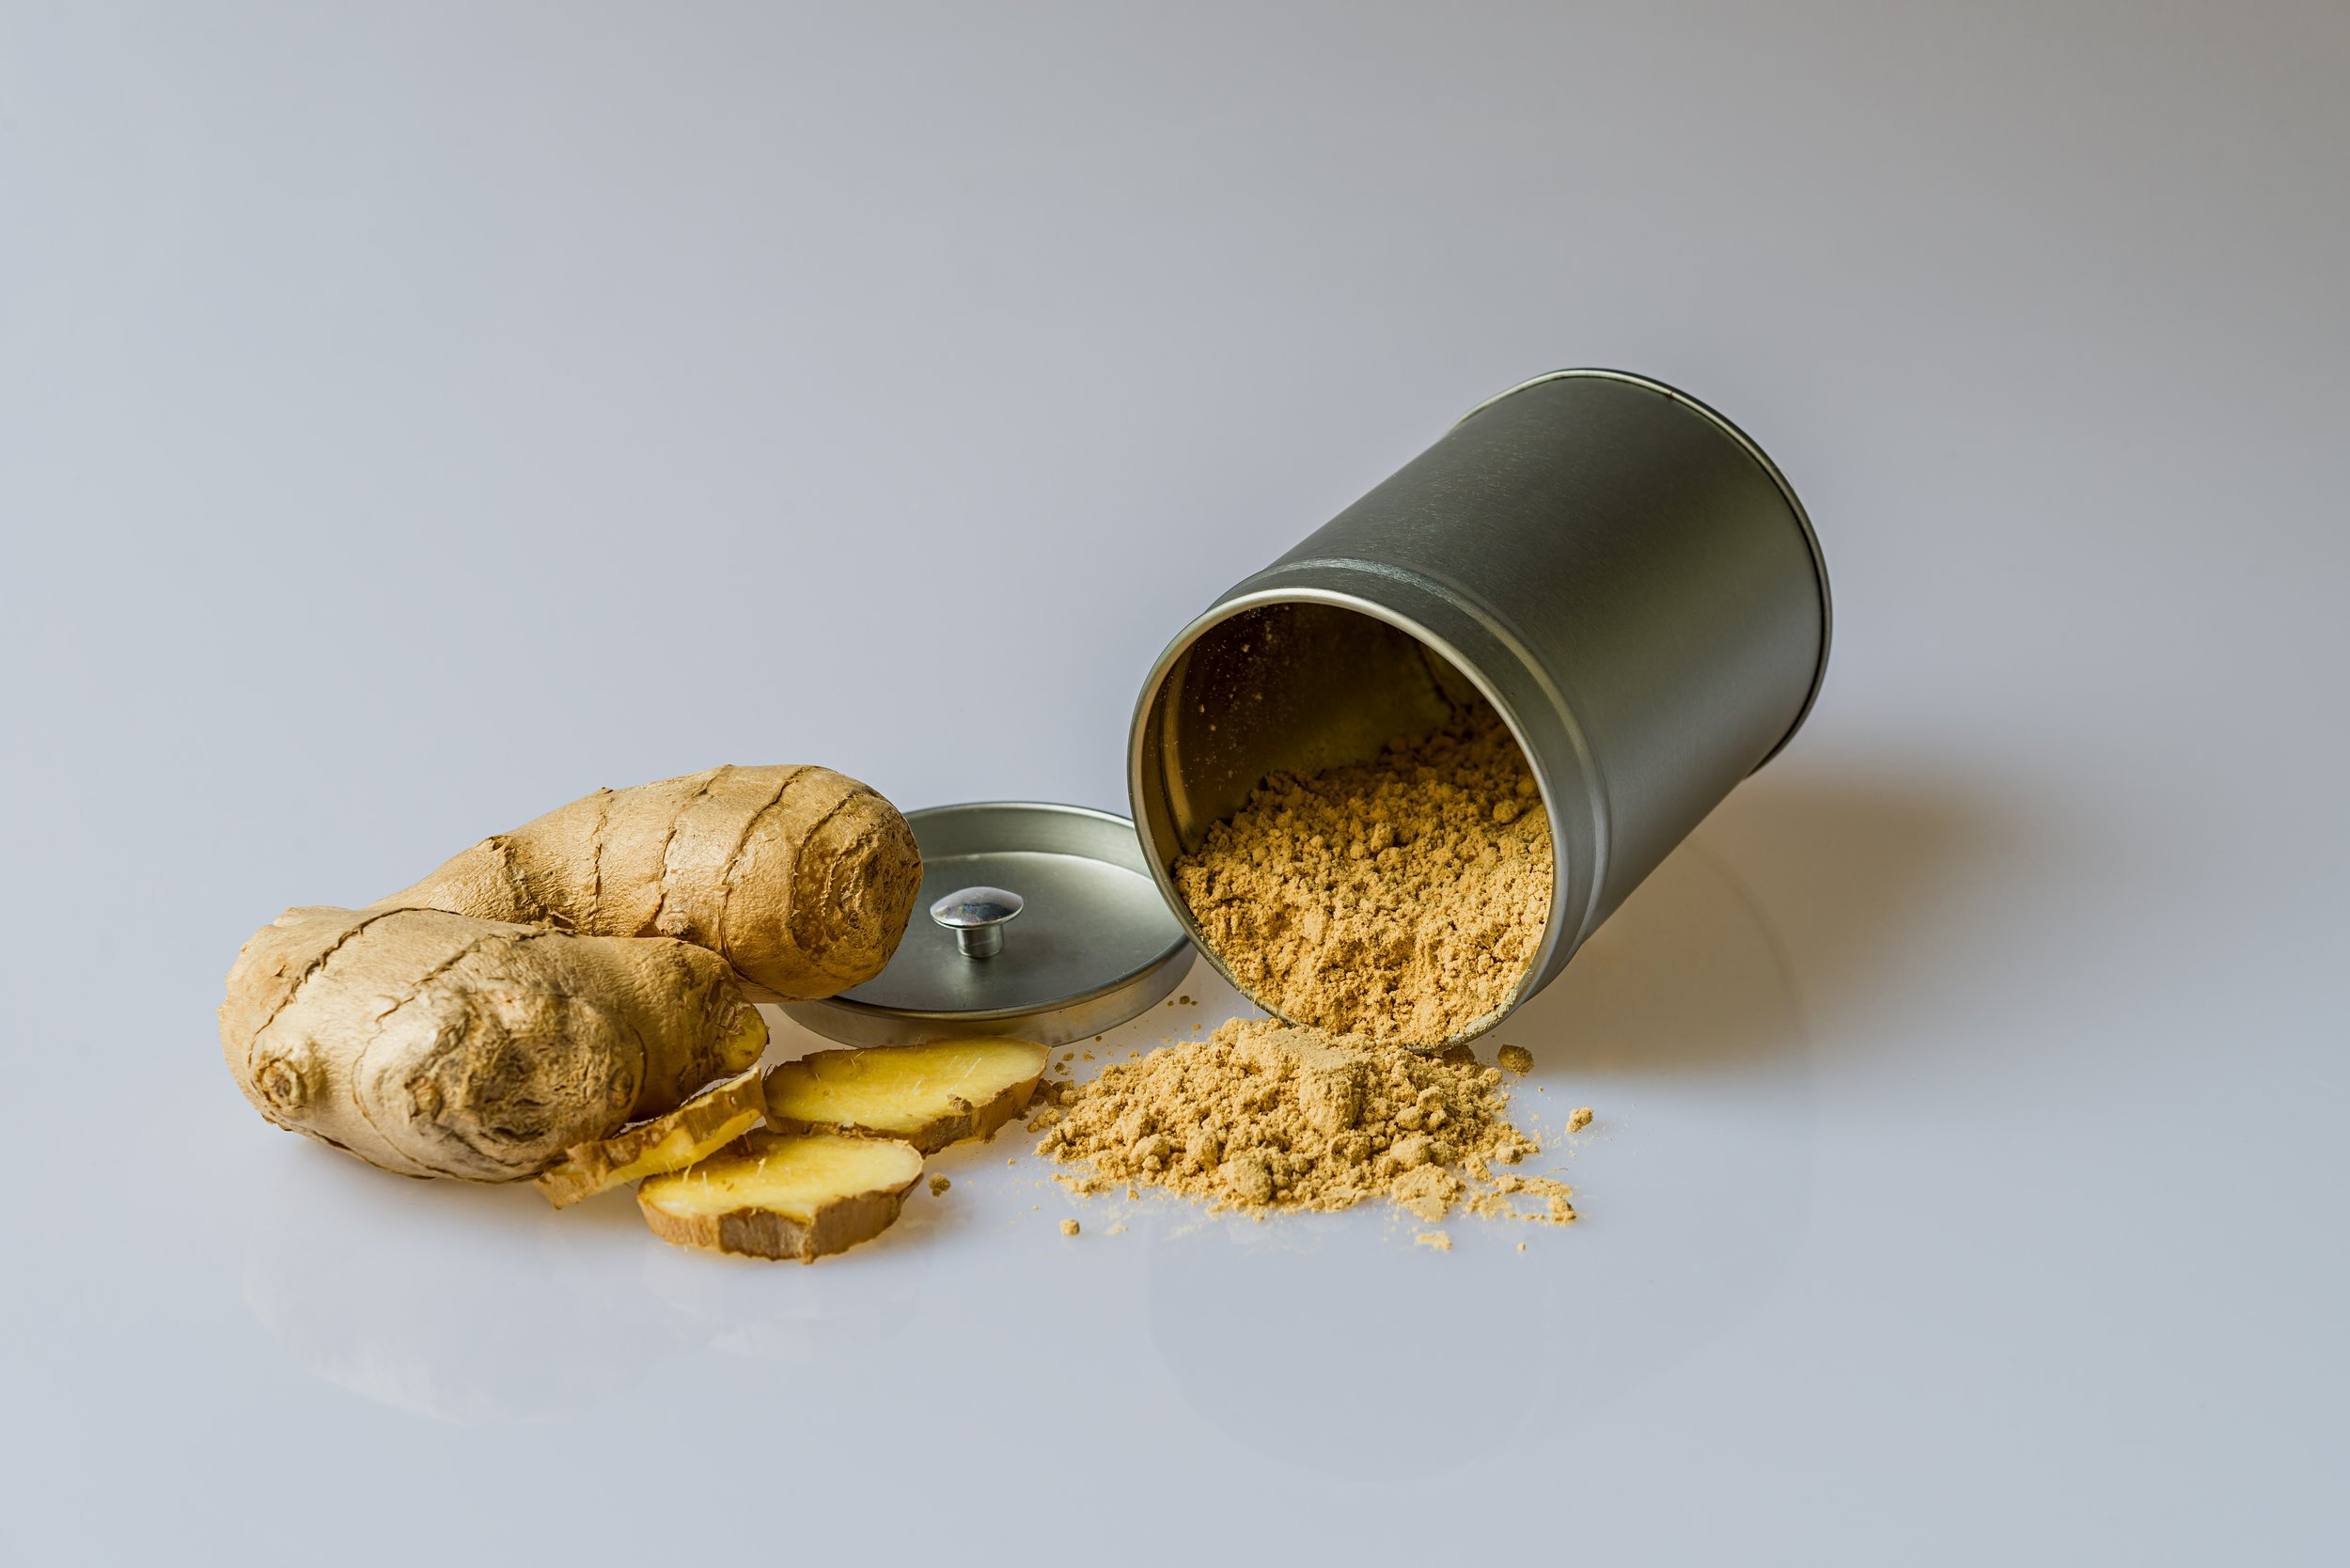 ginger-plant-asia-rhizome-161556.jpg